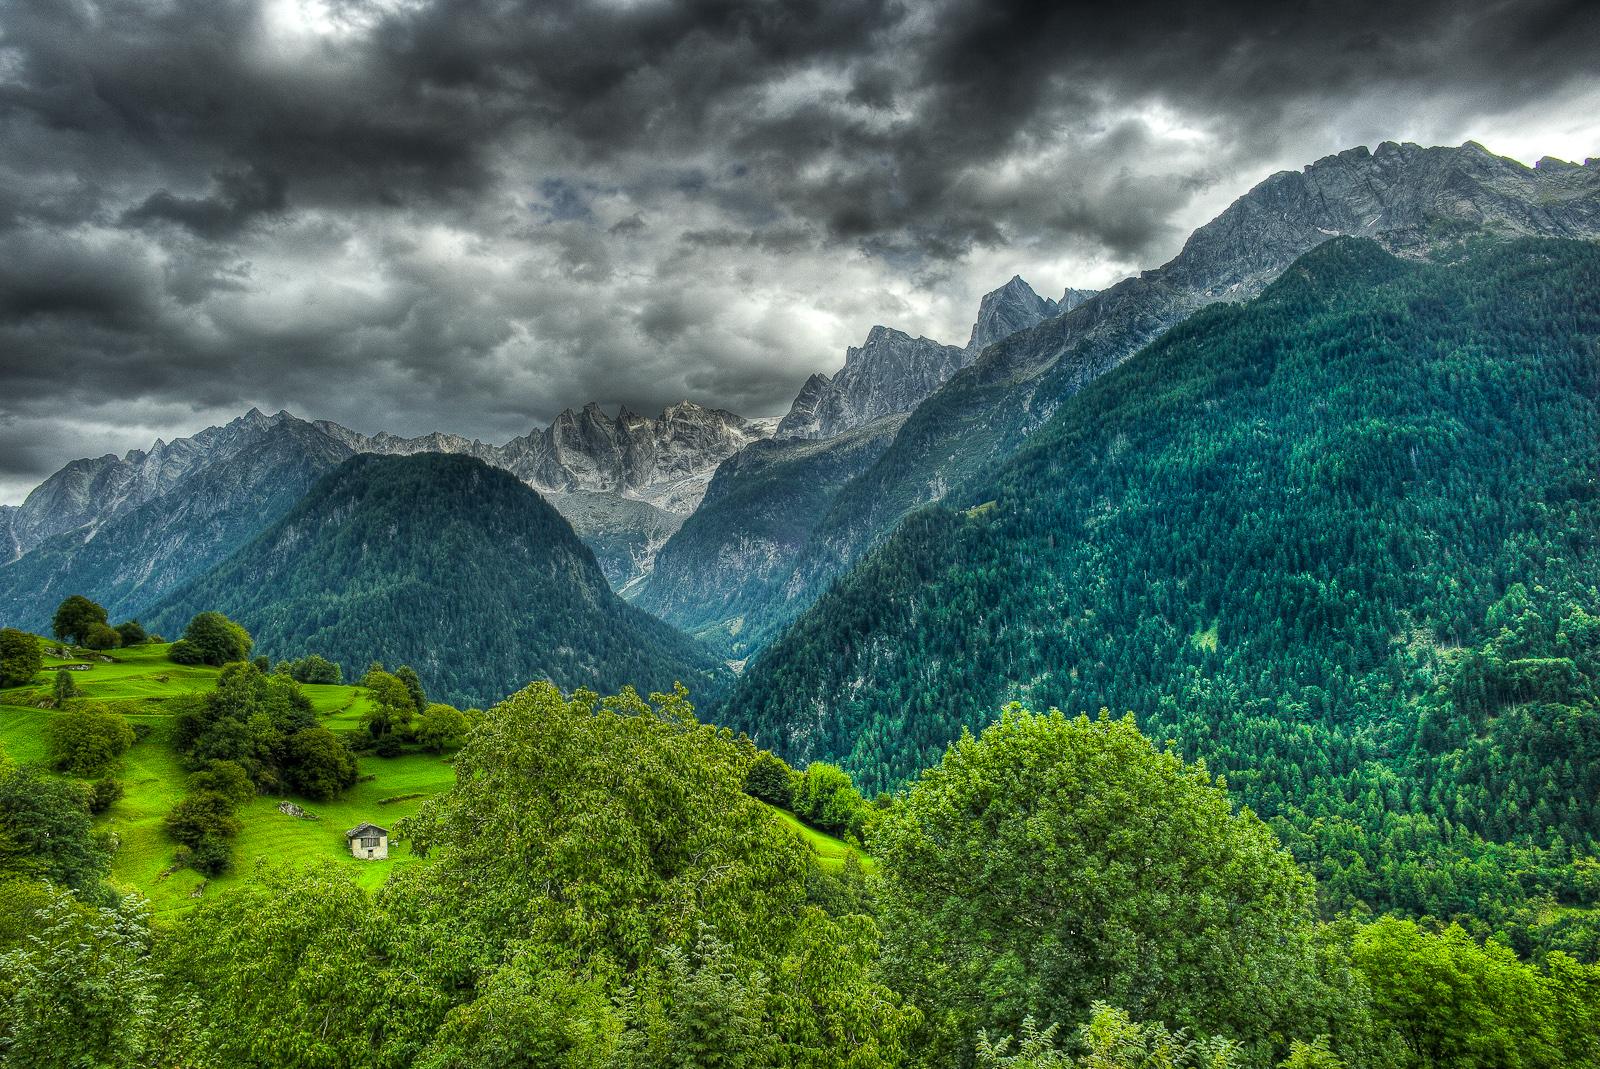 View of the Alps from Soglio, Switzerland